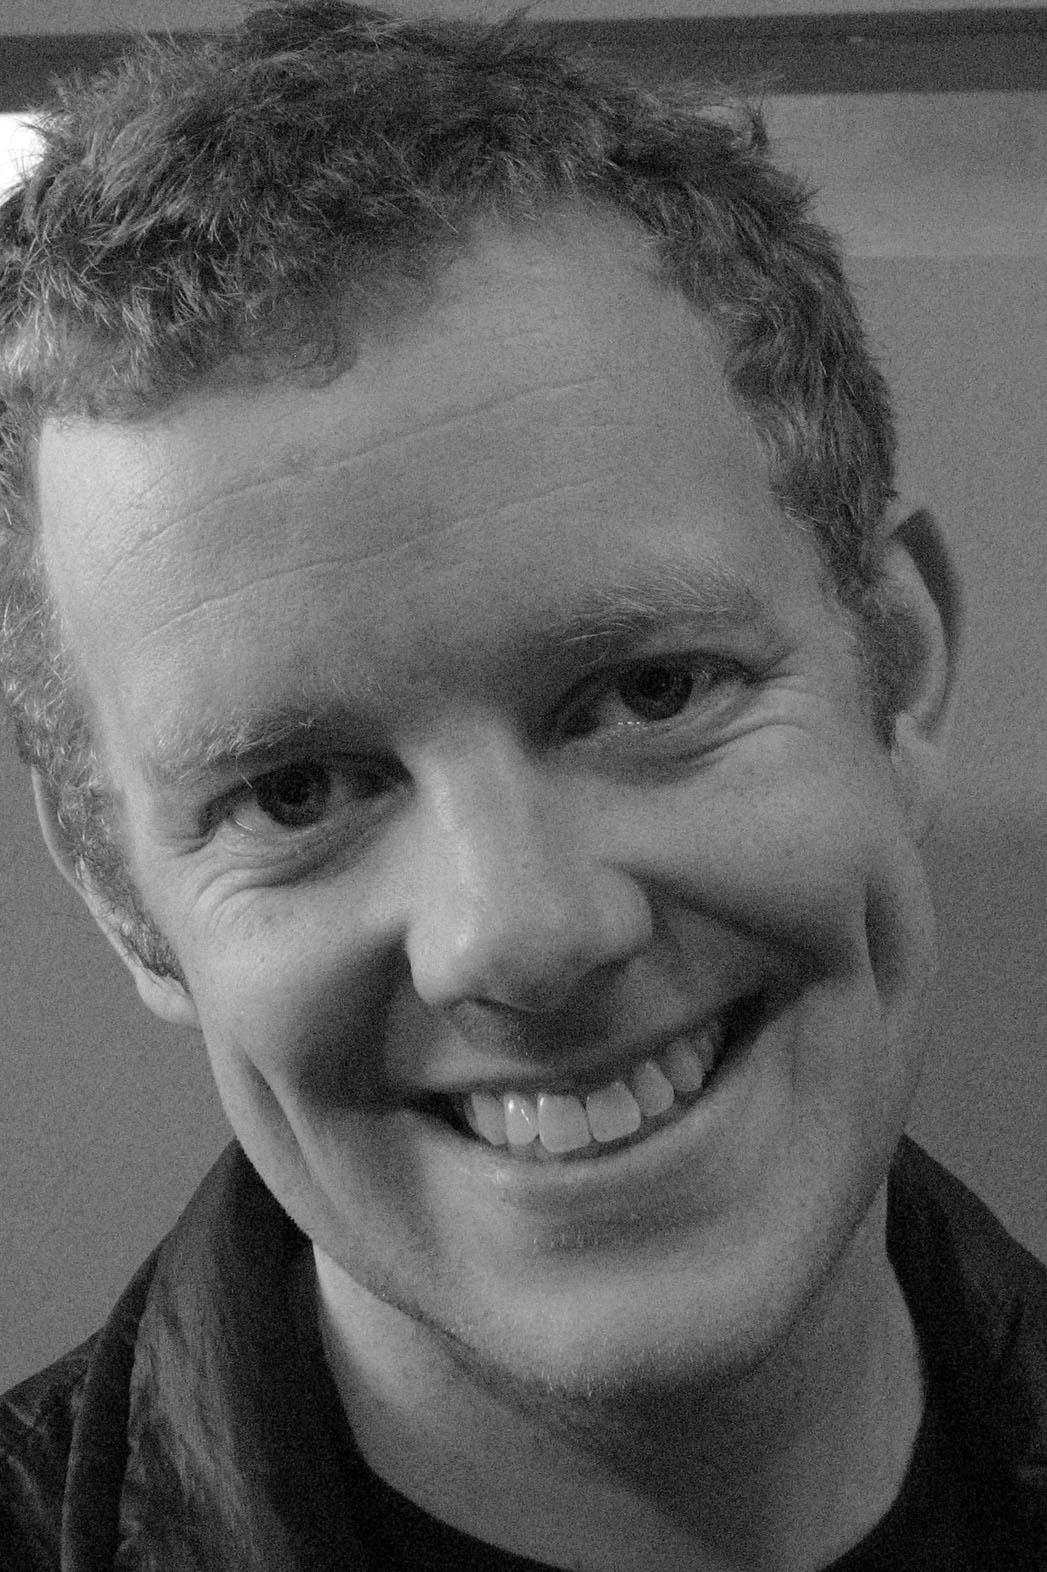 Matt Hubbard Headshot - P 2014